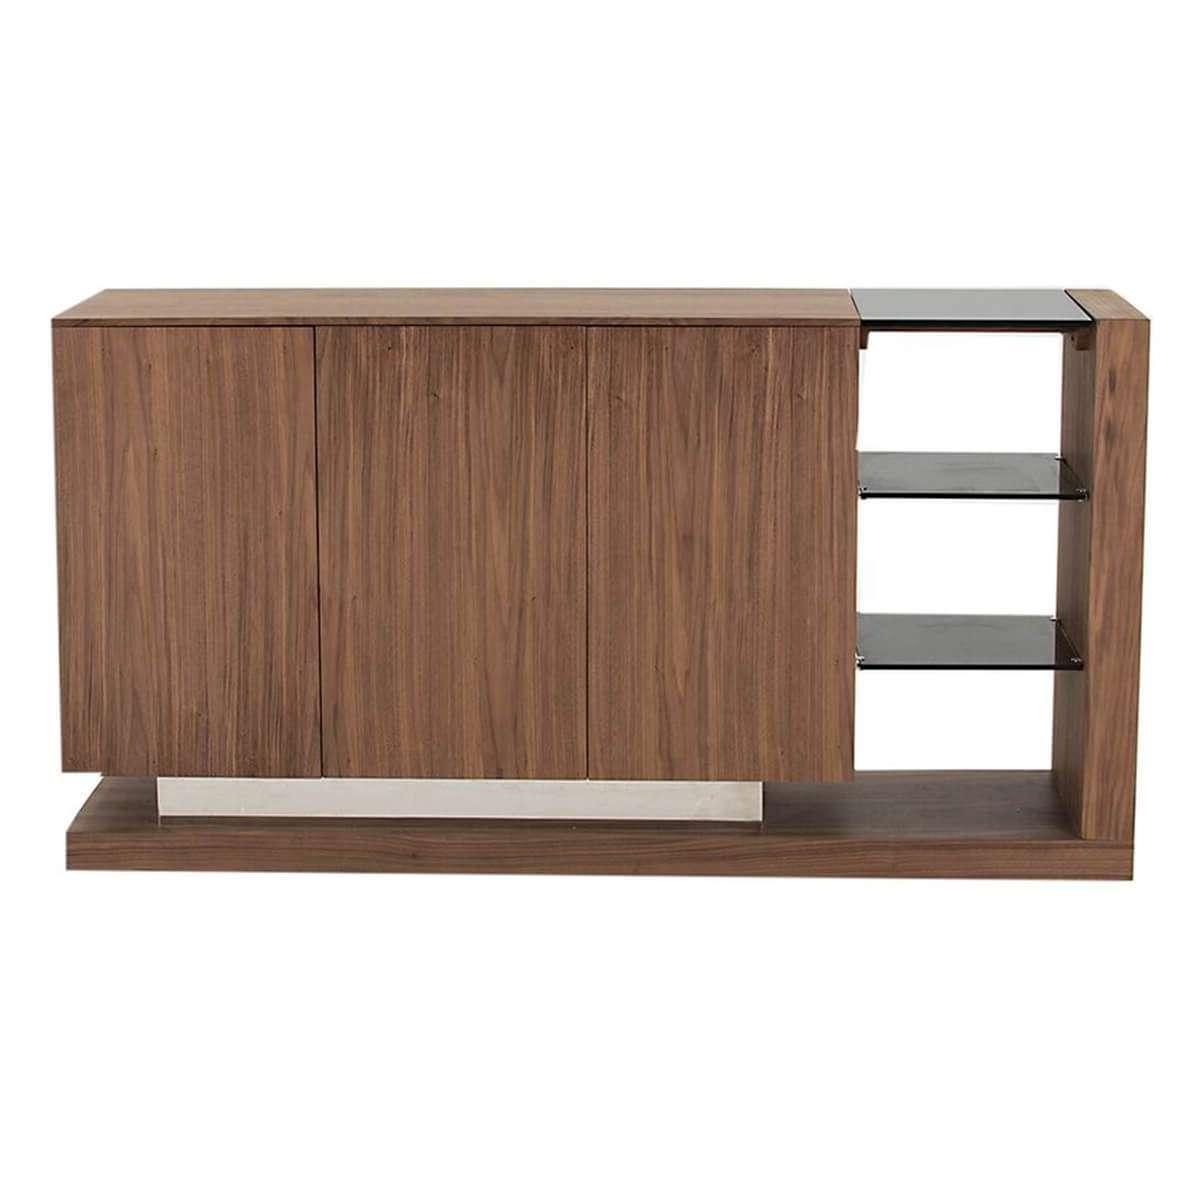 Almara Steel & Walnut Sideboard | Modern Sideboards | Fads Throughout Modern Sideboards (View 1 of 20)